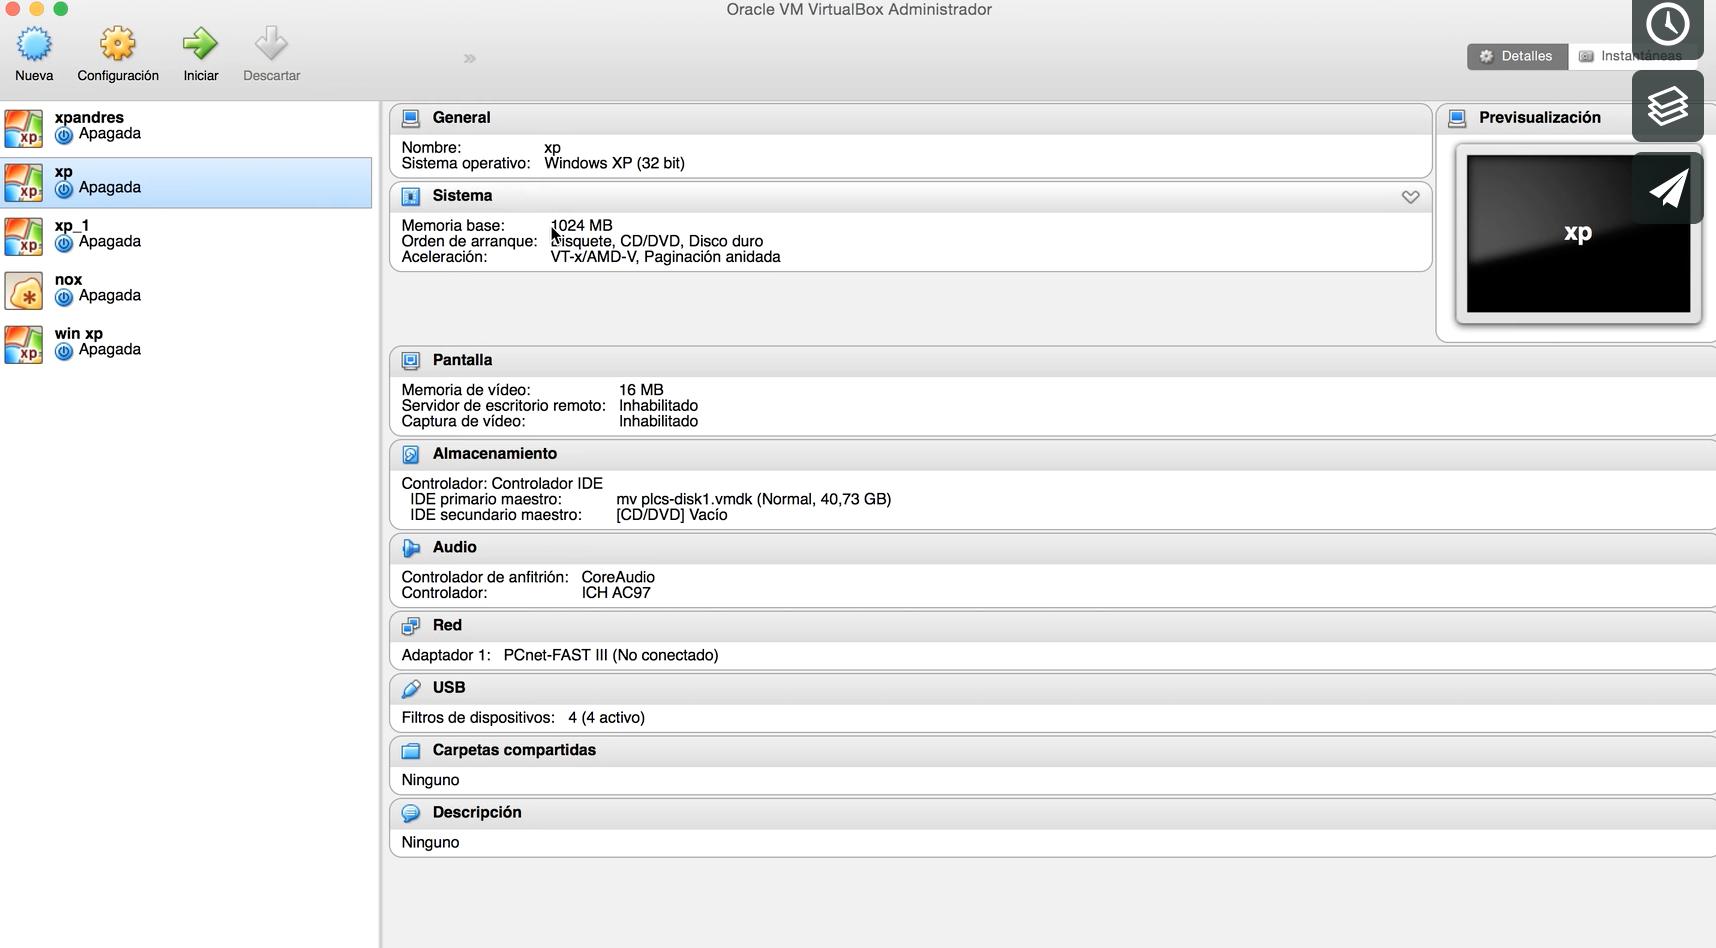 curso virtual box en mac-video5